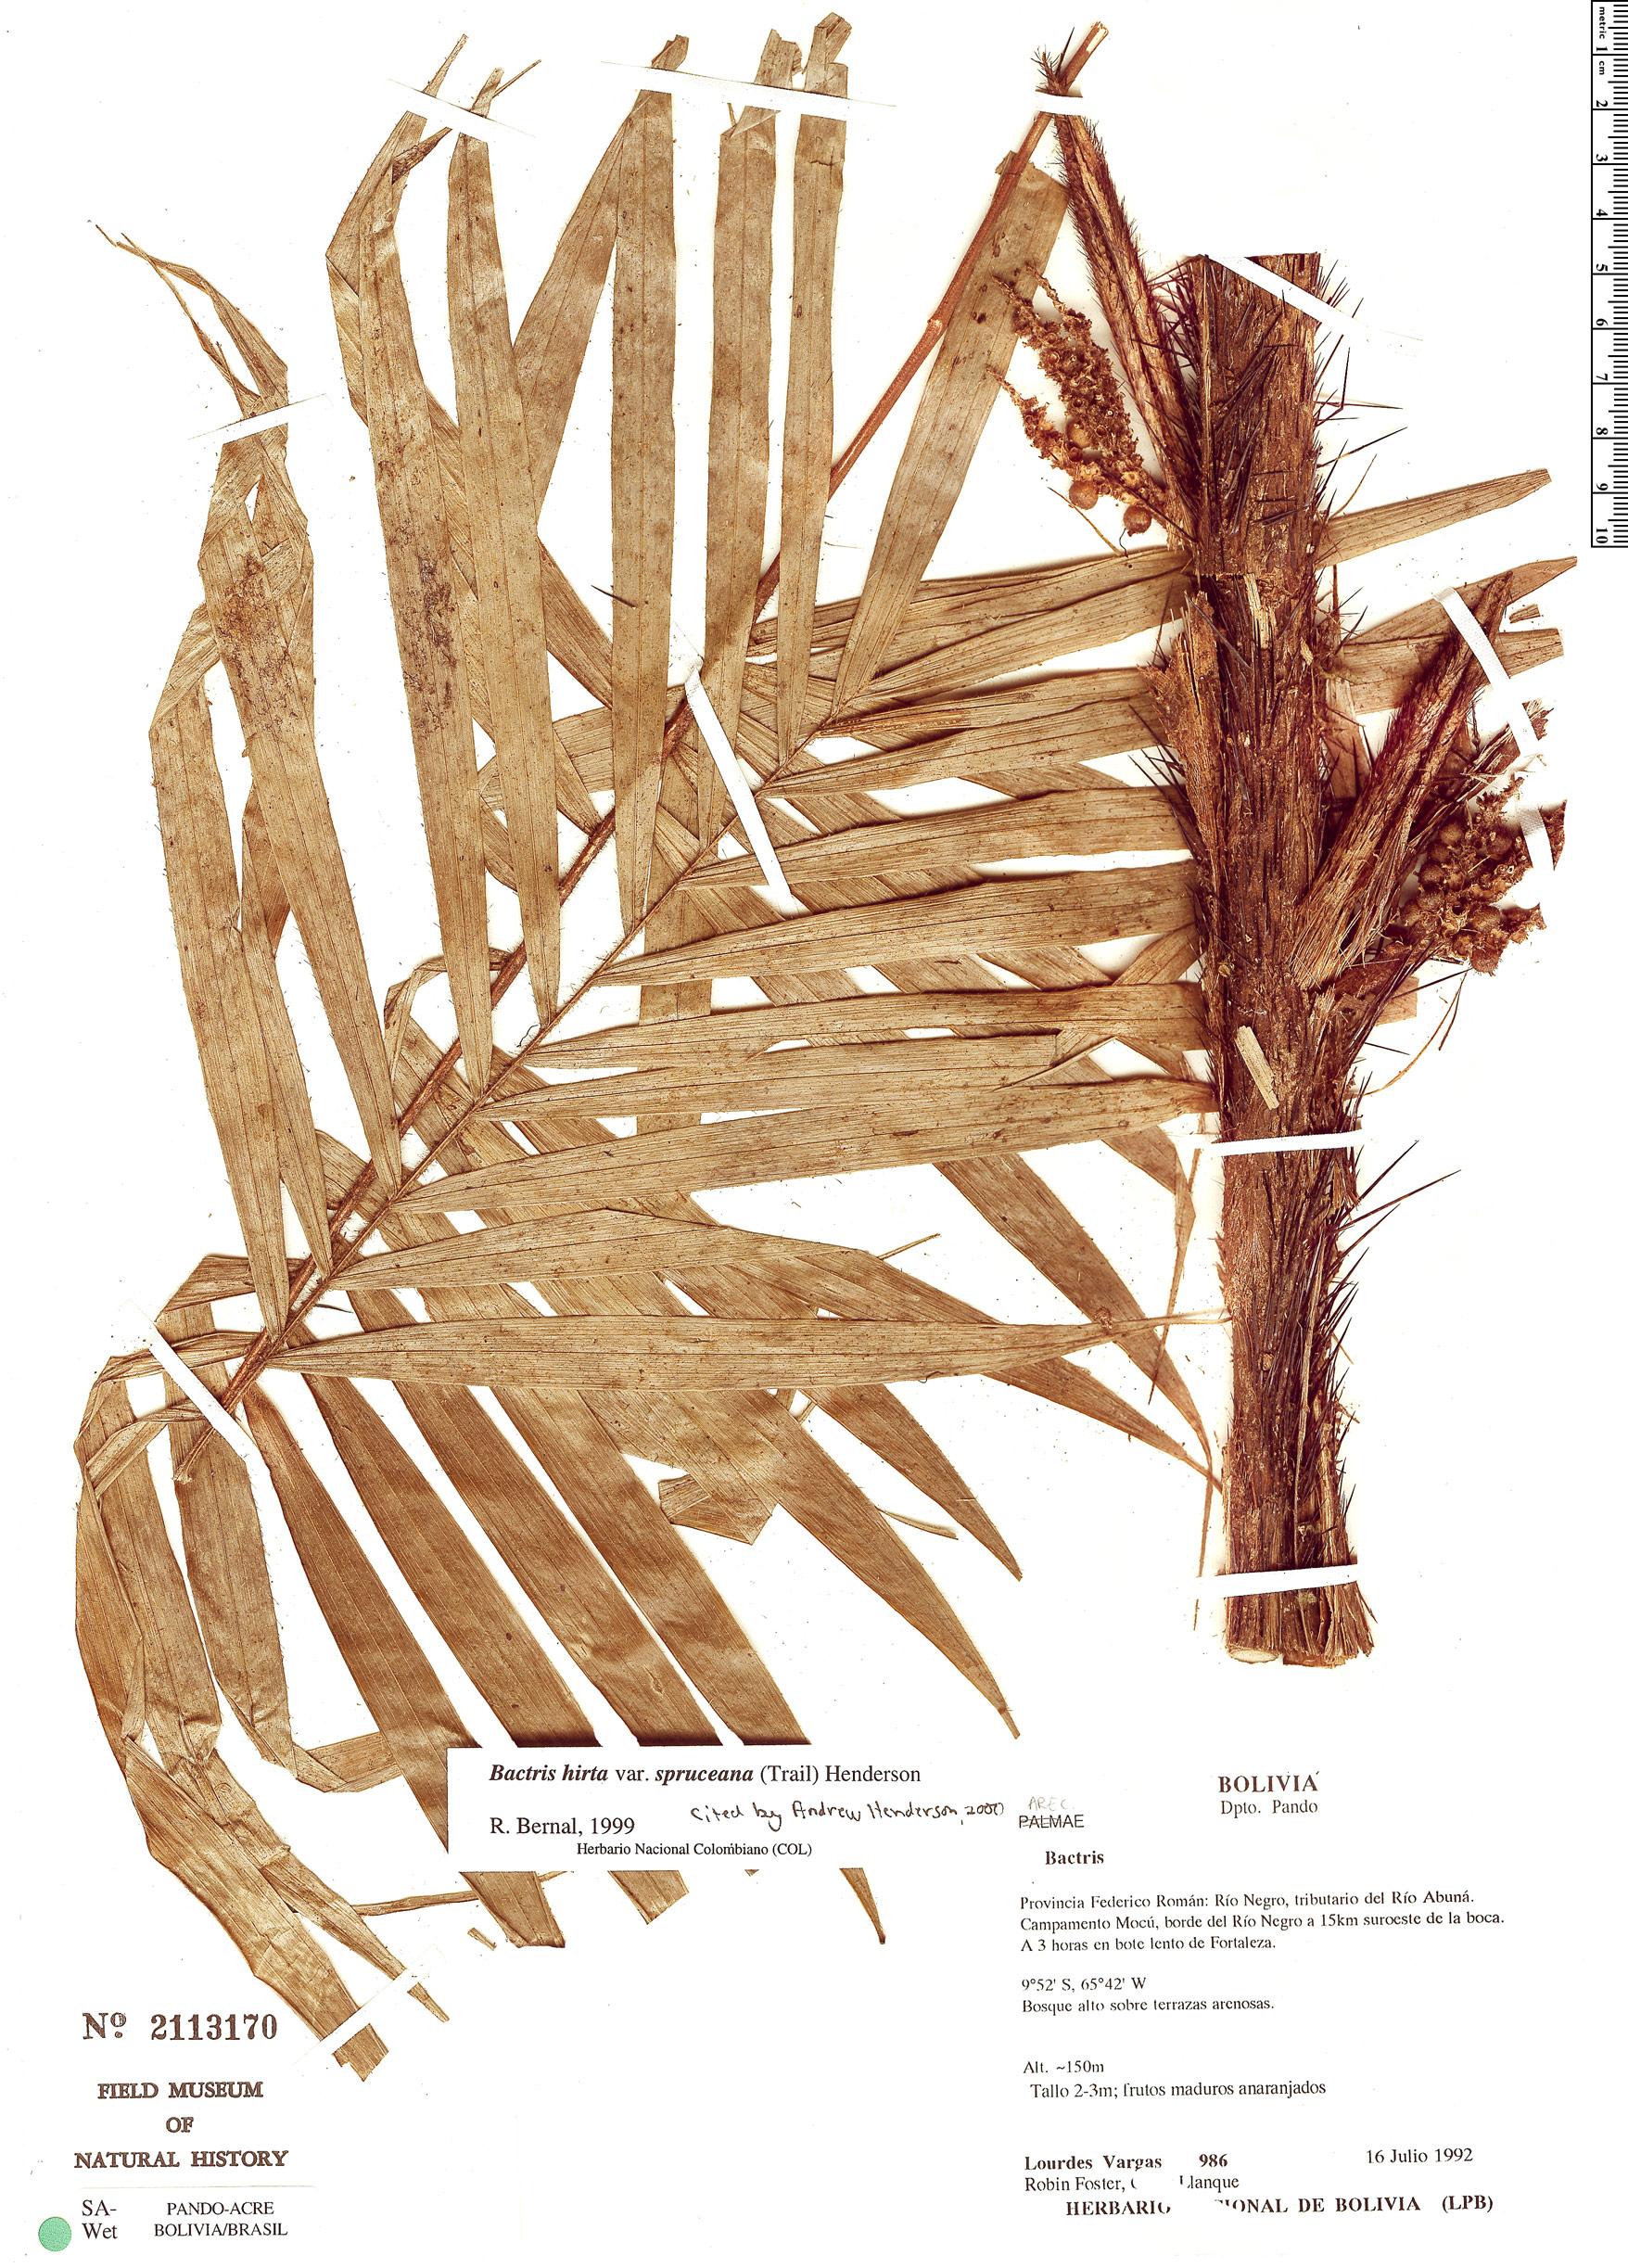 Specimen: Bactris hirta